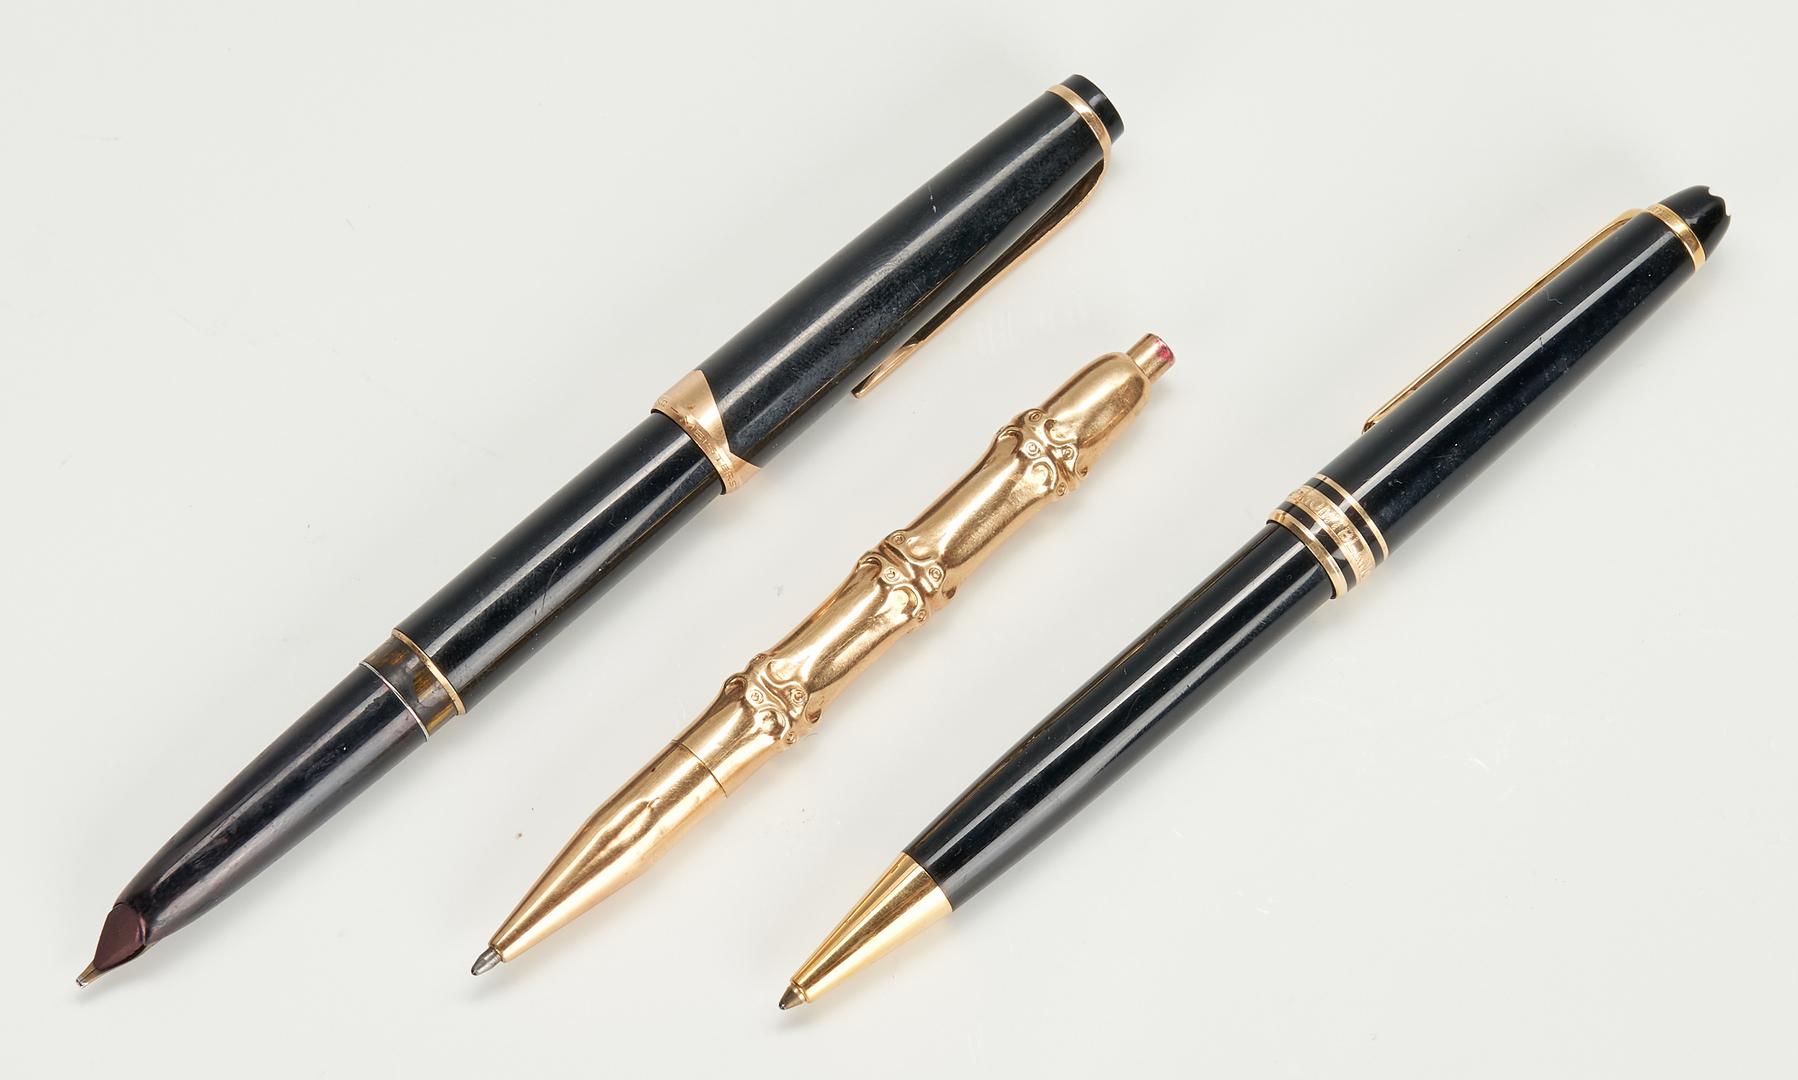 Lot 786: 5 Pens – 2 Montblanc, 2 gold color, 1 Marked 14k